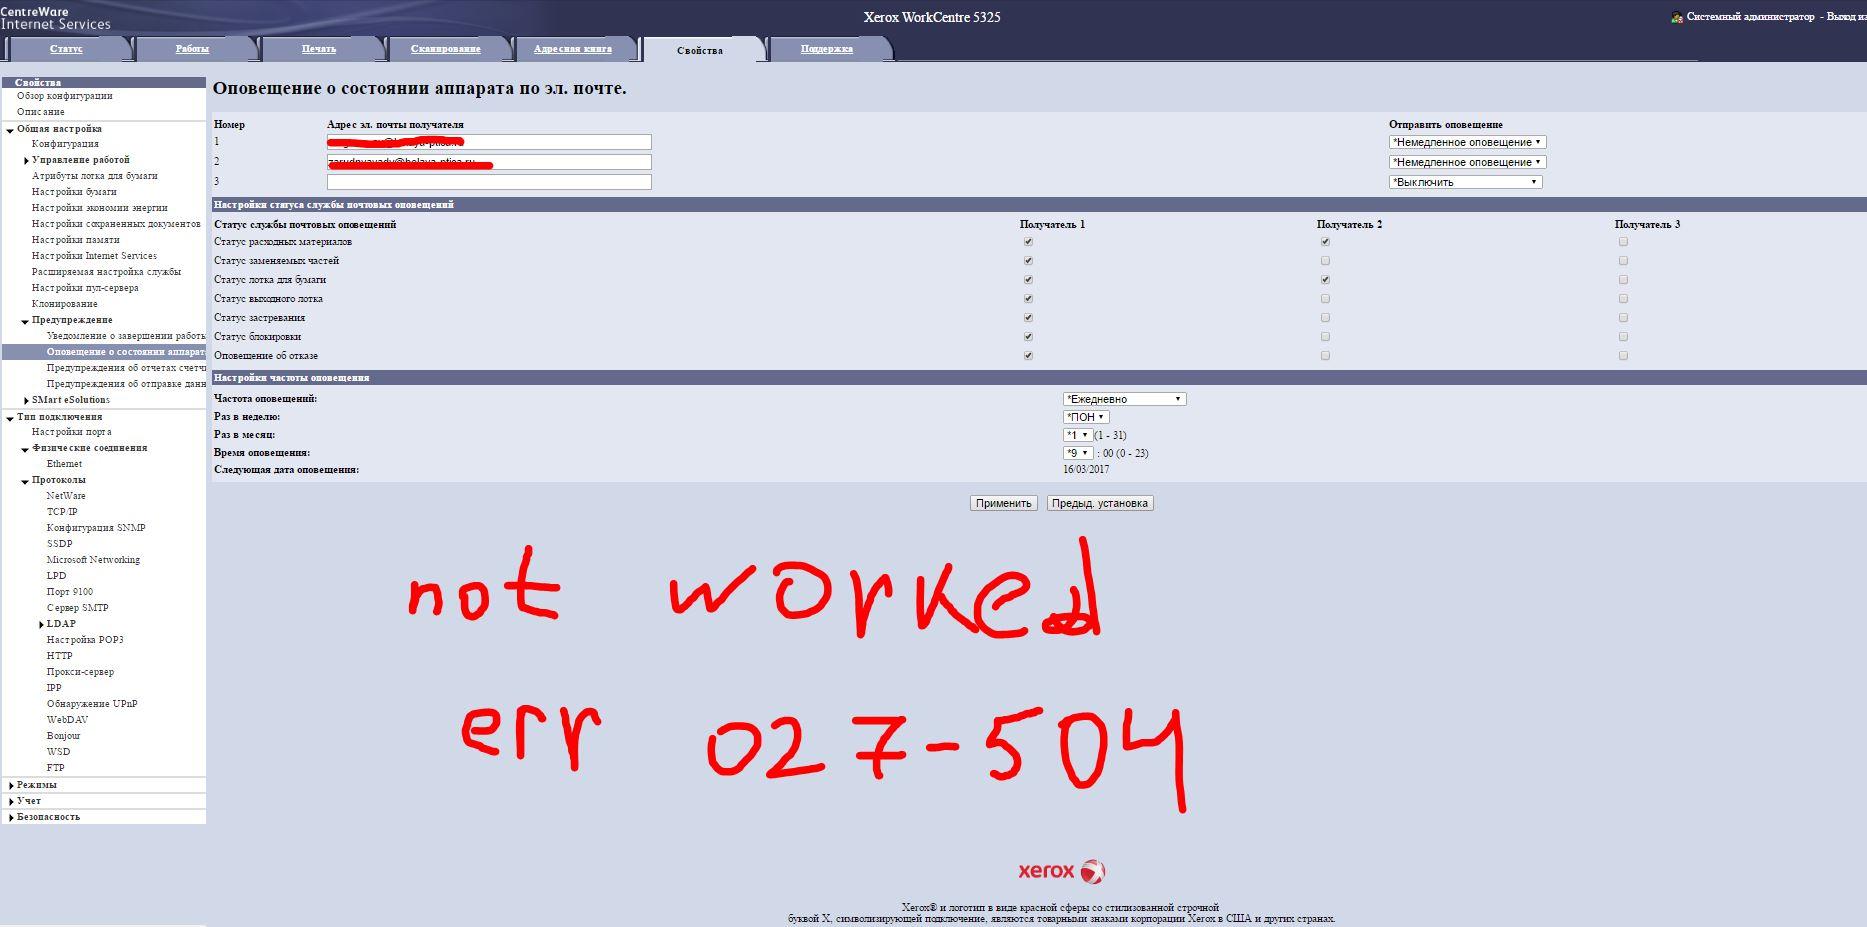 Xerox 5325 error 027-504 - Customer Support Forum